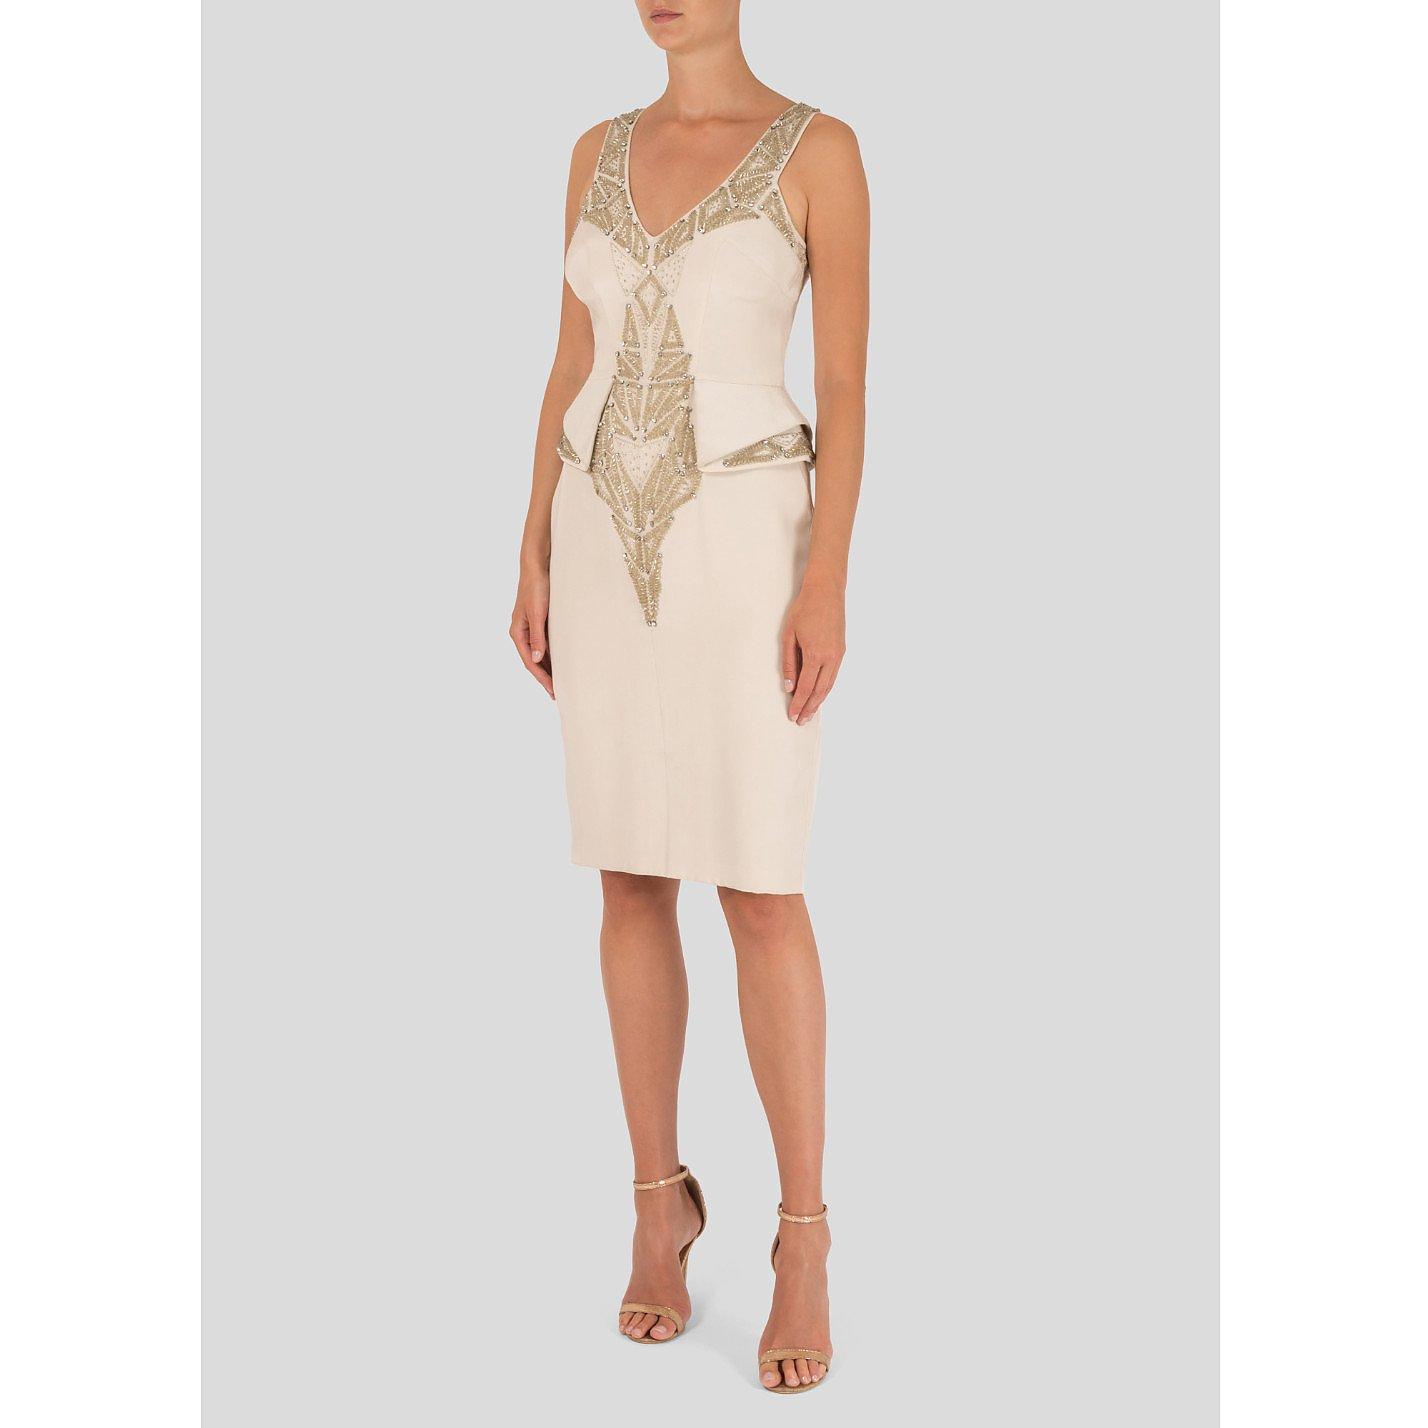 Amanda Wakeley Bridal Atelier Bridal Midi Dress